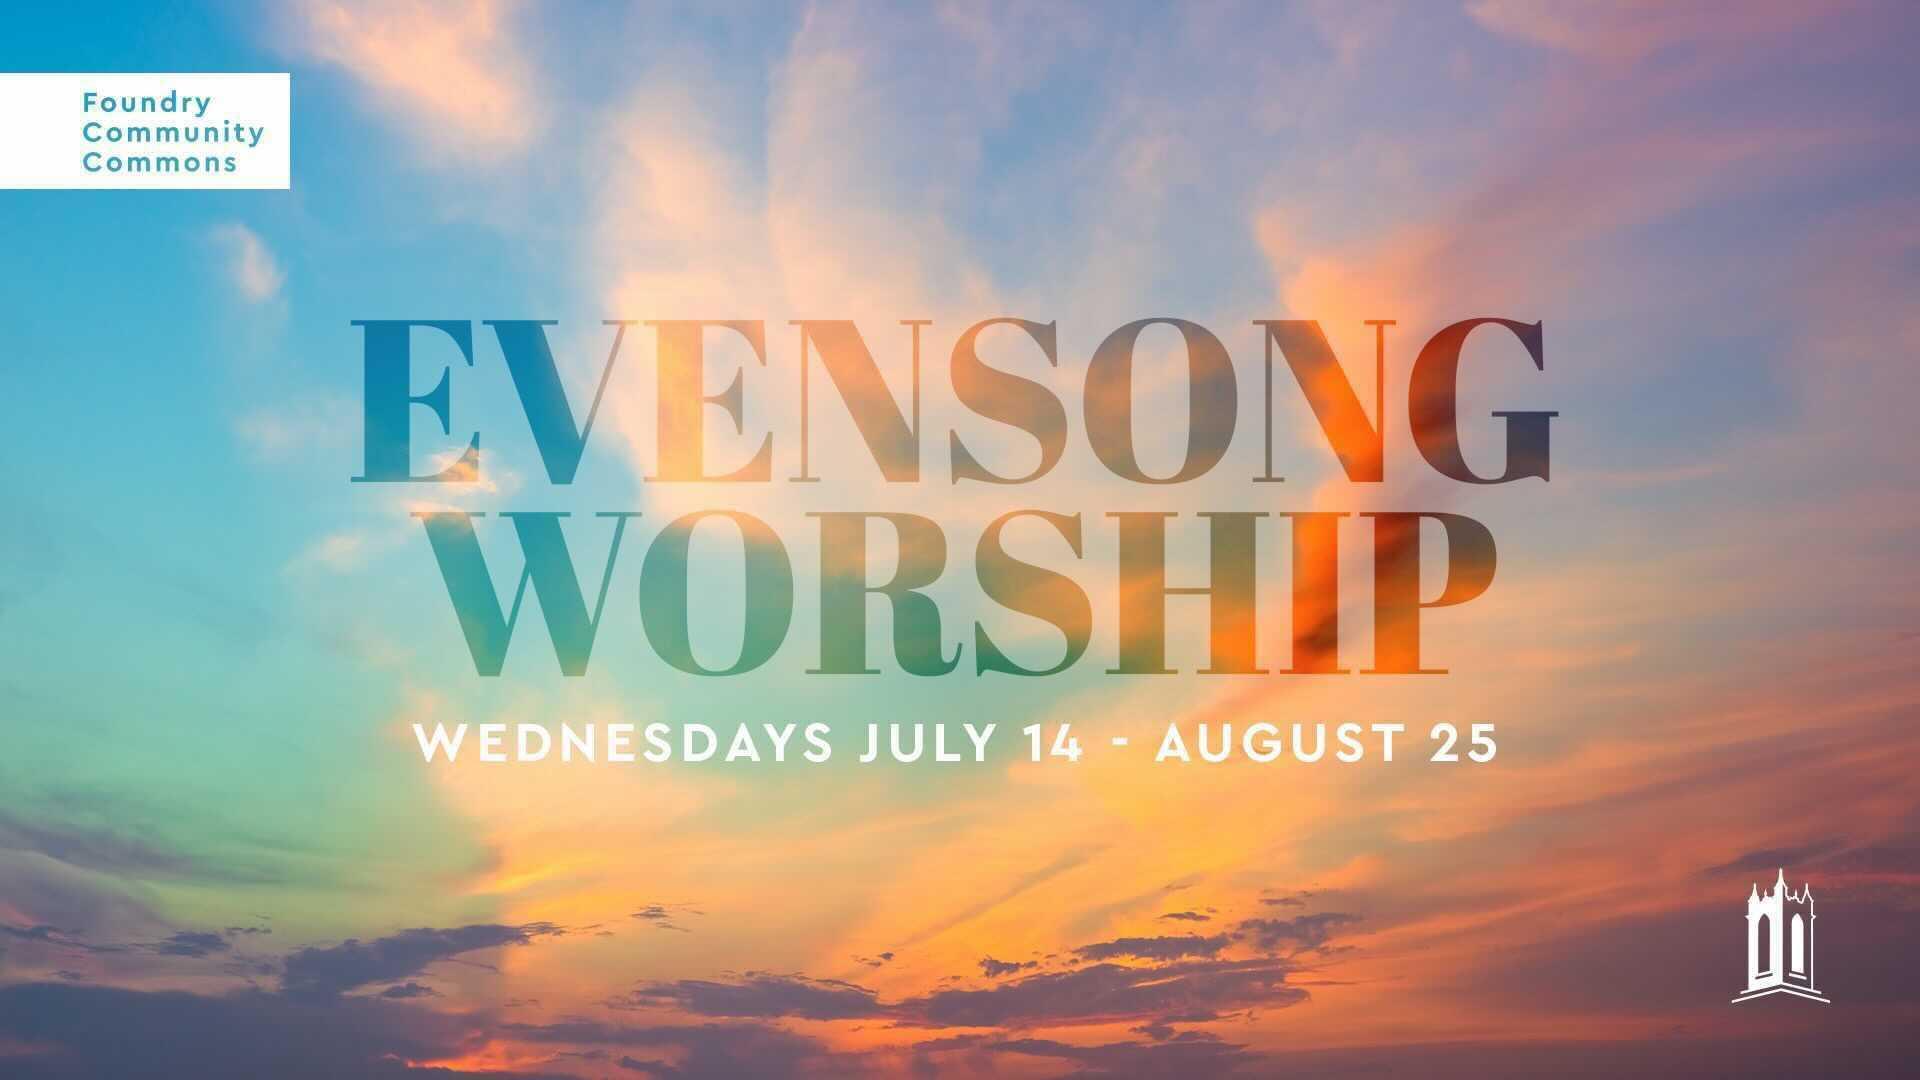 Evensong Worship